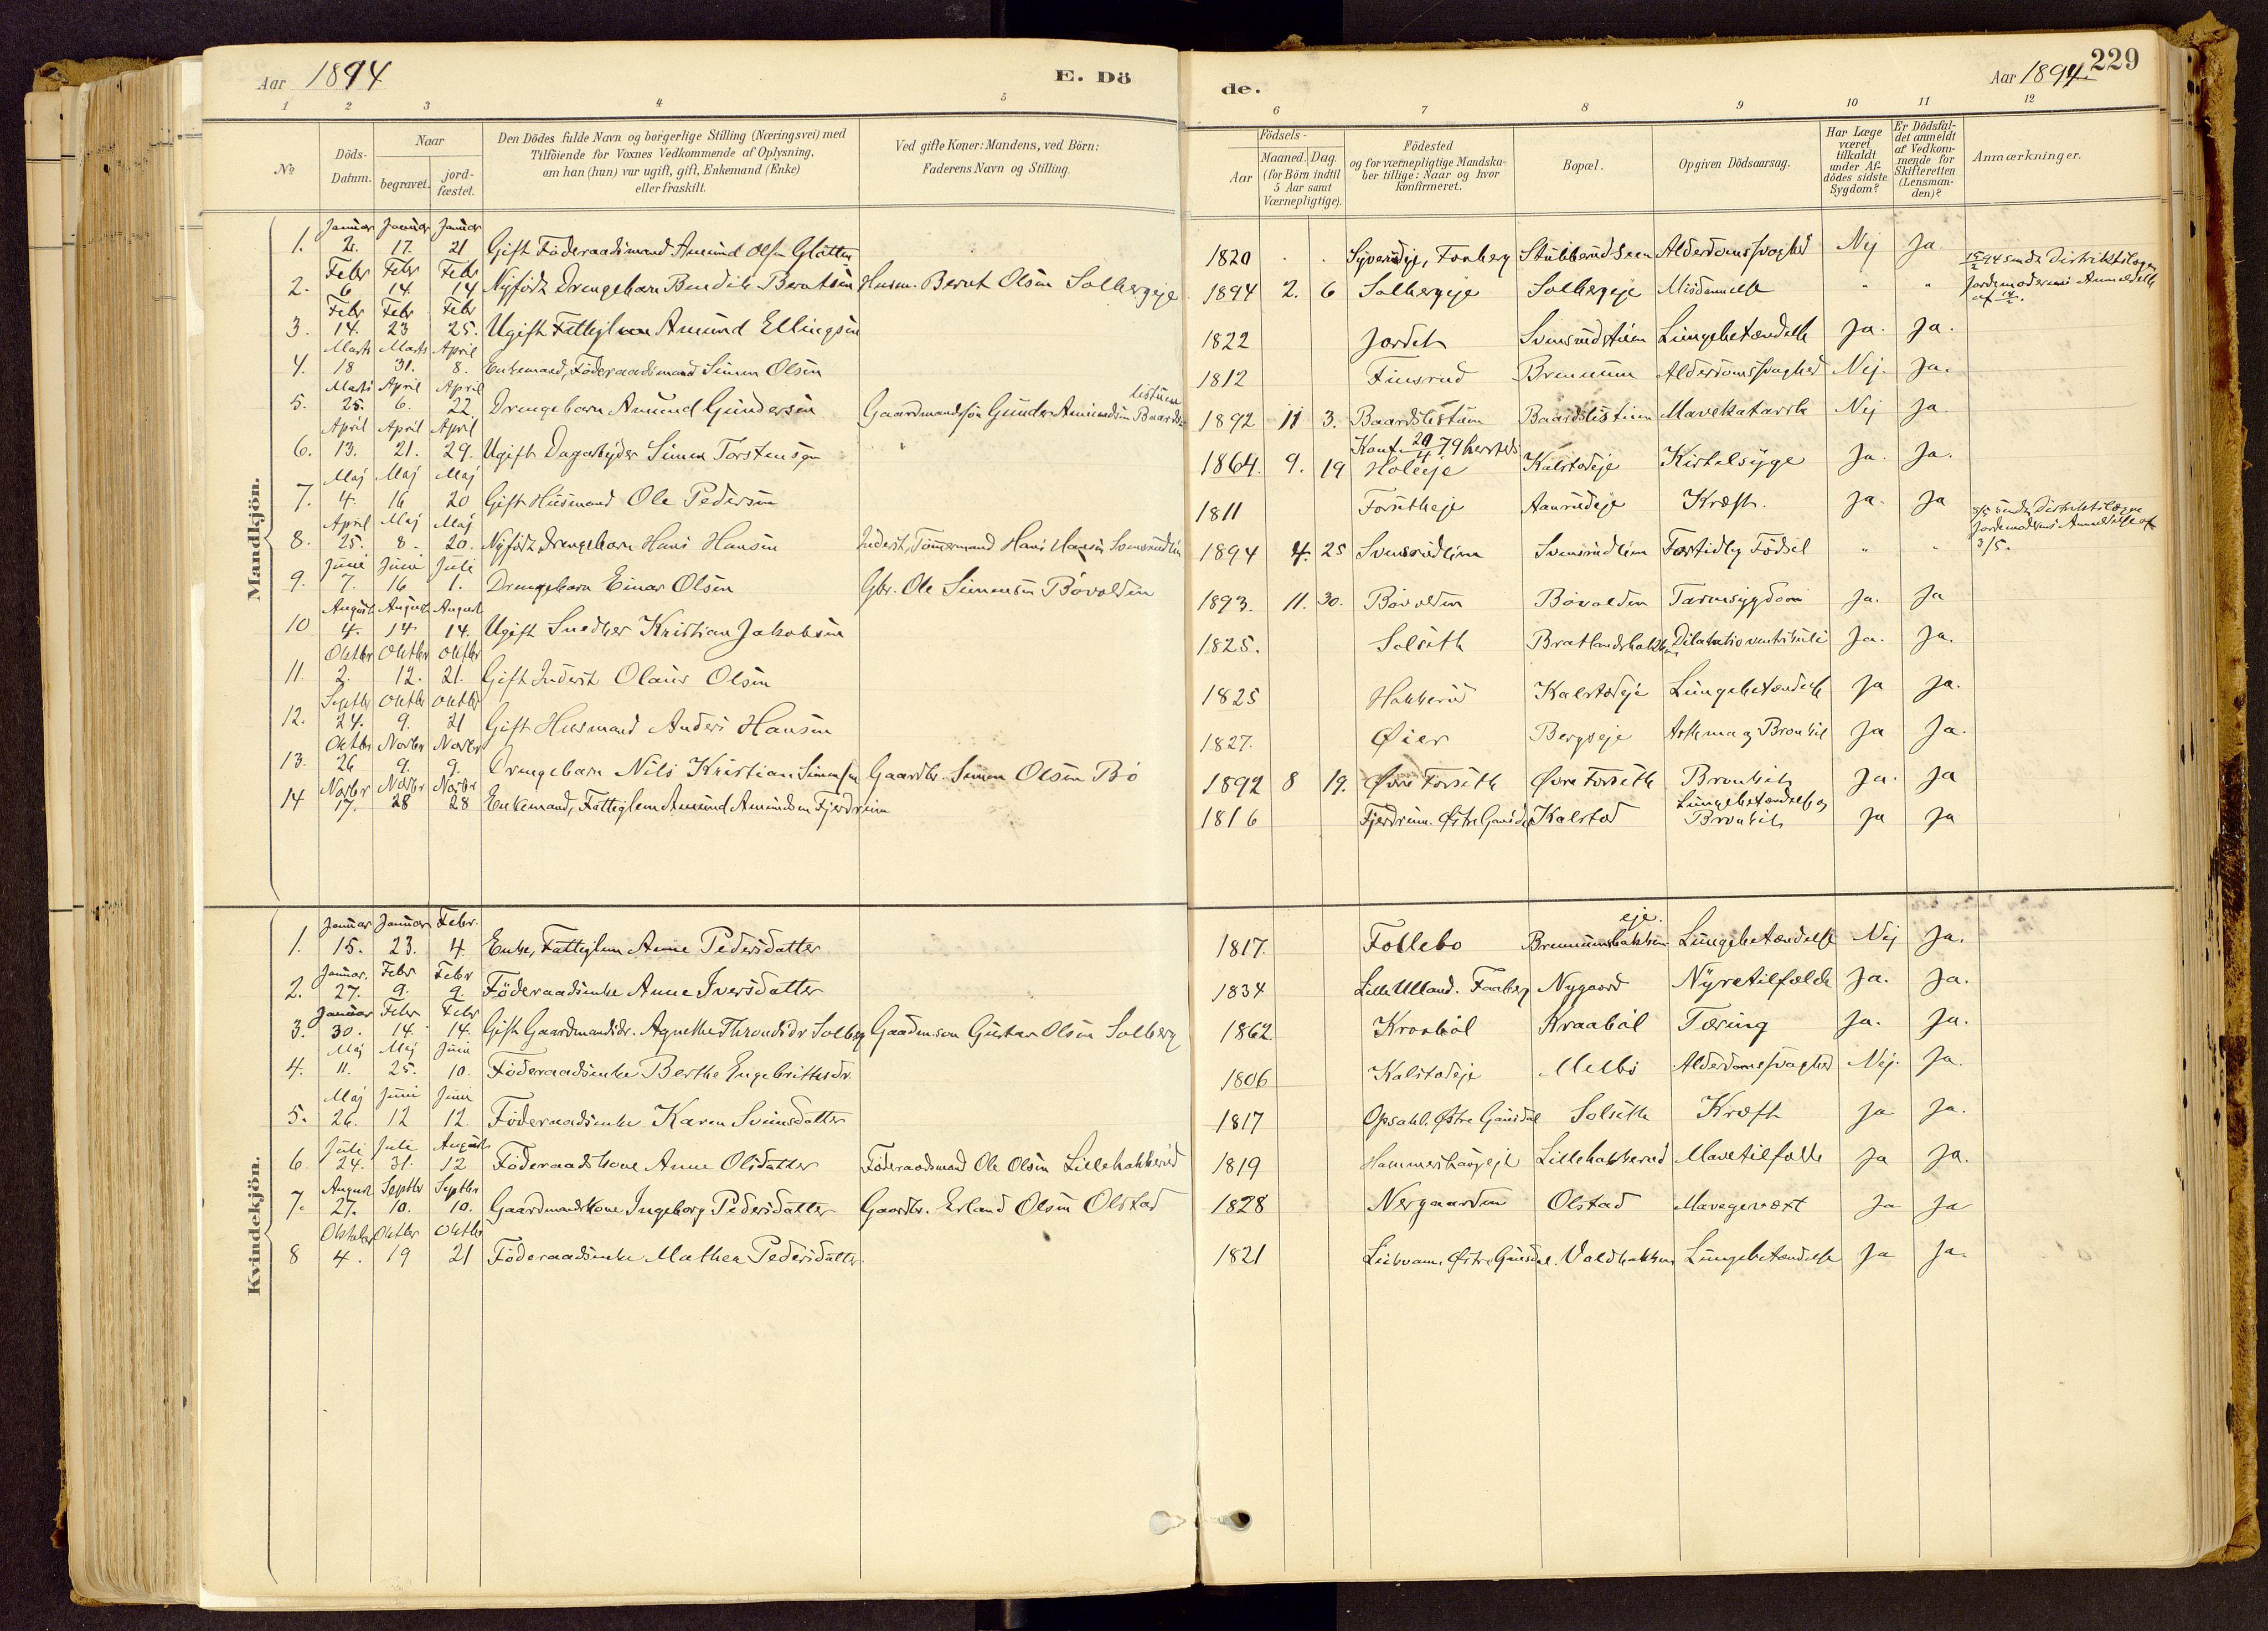 SAH, Vestre Gausdal prestekontor, Ministerialbok nr. 1, 1887-1914, s. 229